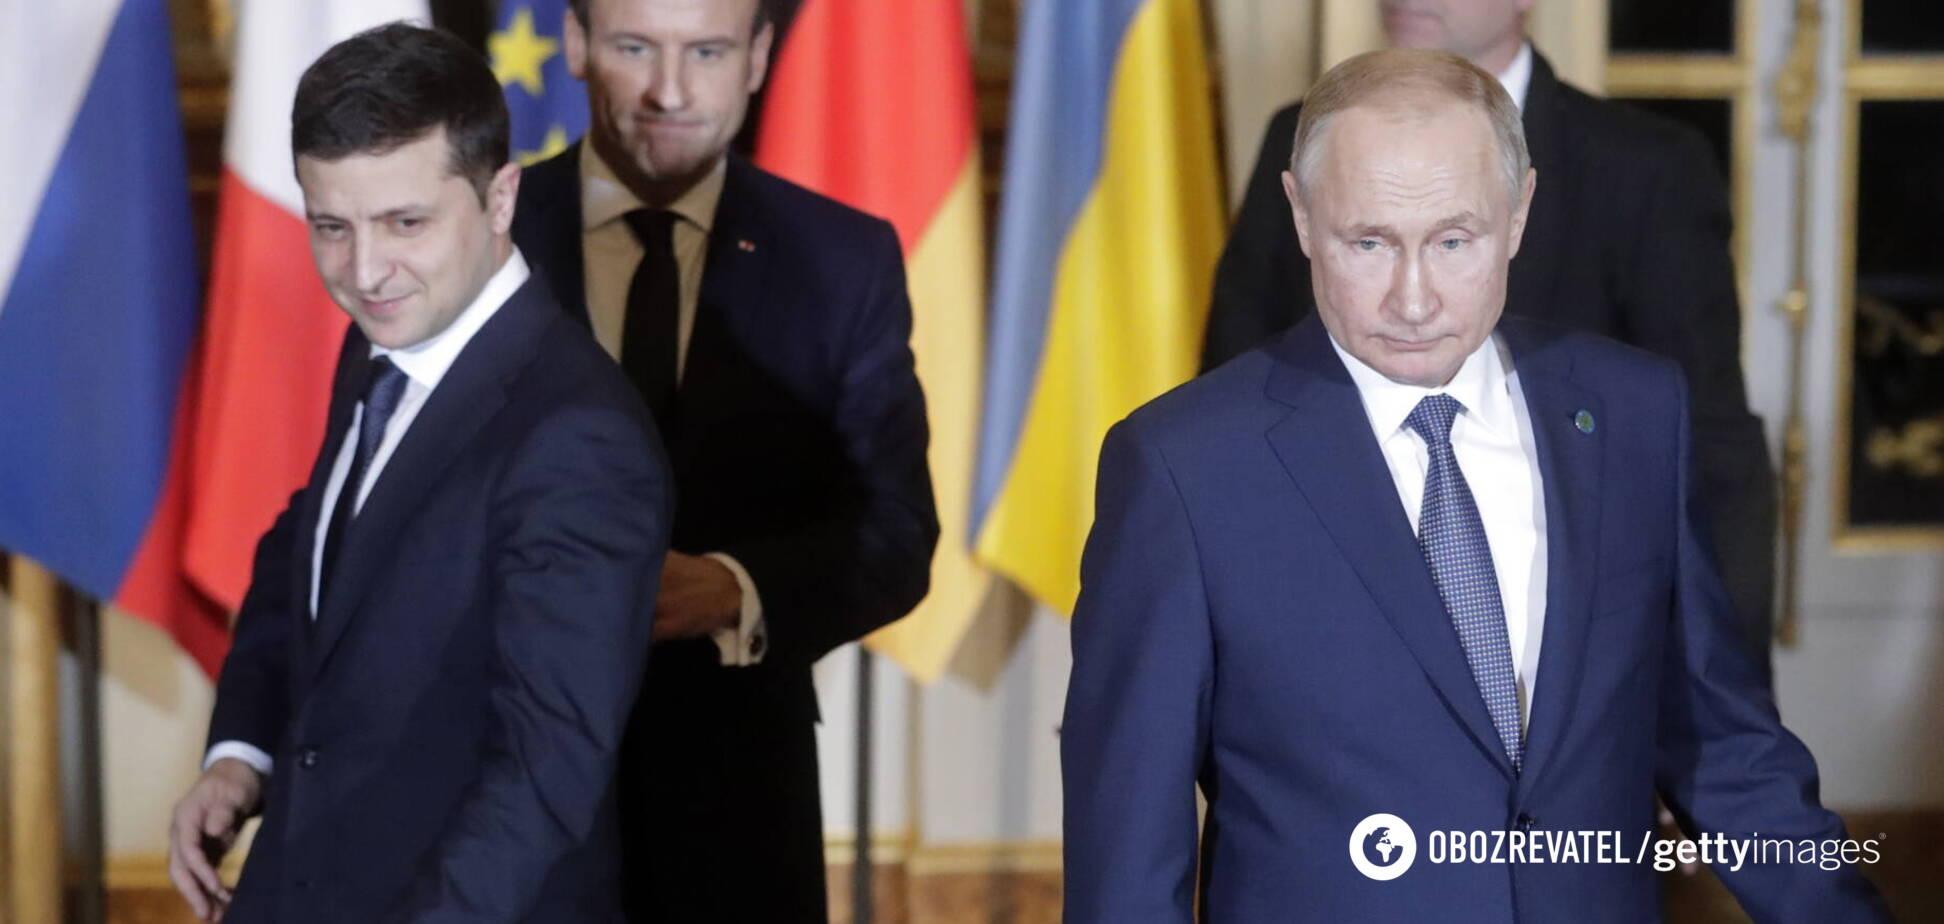 Кремль обрав момент для тиску на Зеленського, – Пономарьов